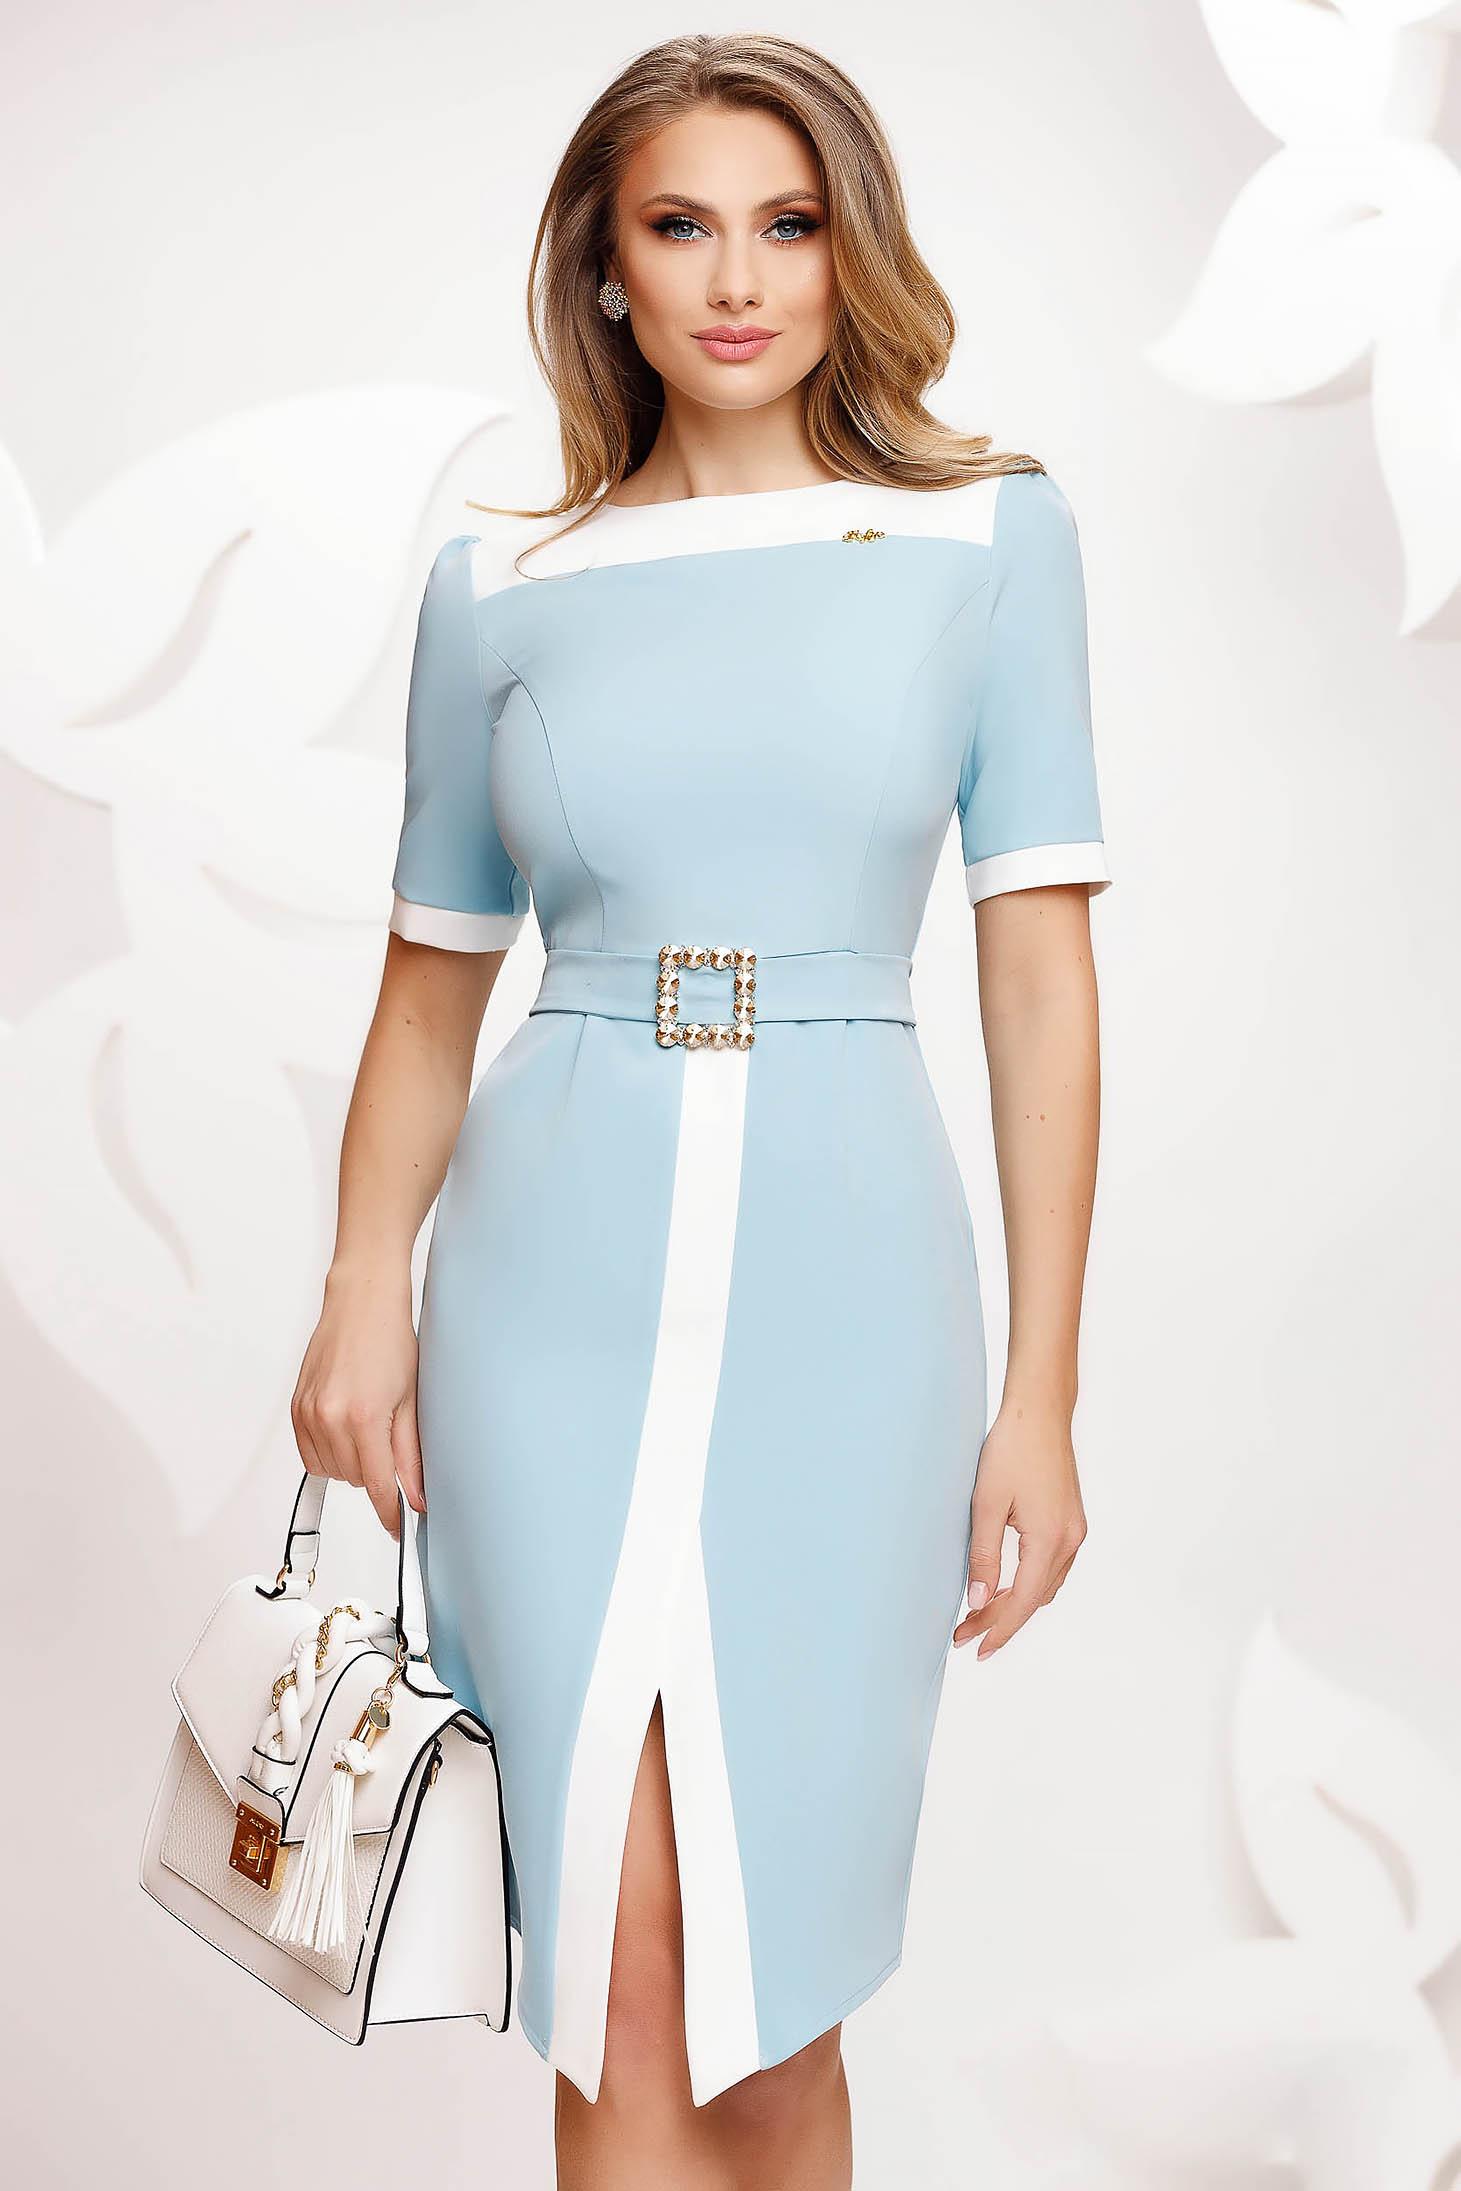 Lightblue dress elegant slit with tie back belt